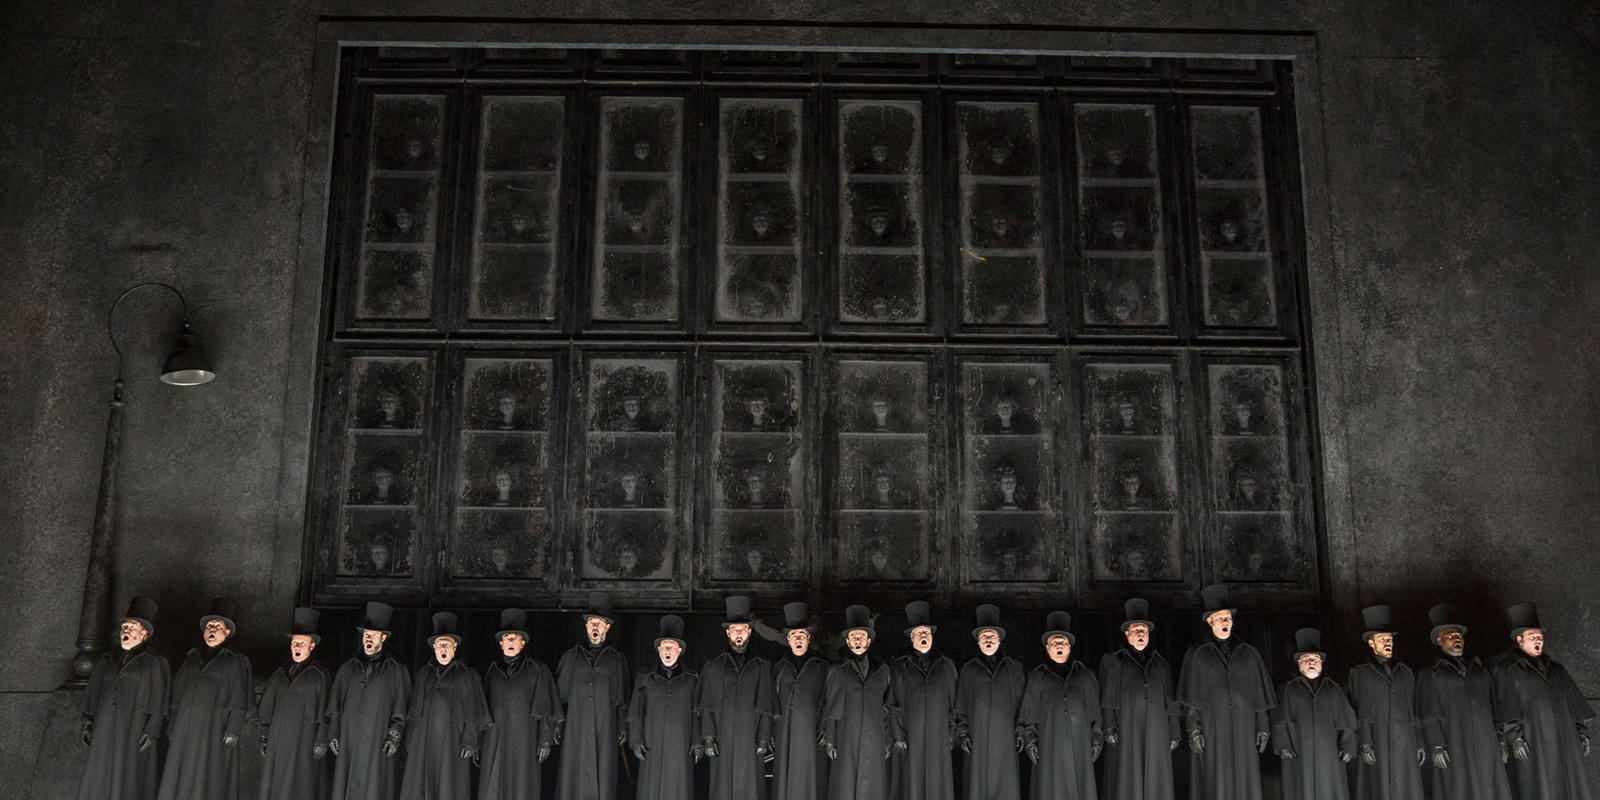 ENO 2018/19 Jack the Ripper: The Women of Whitechapel: Male members of the ENO Chorus © Alastair Muir